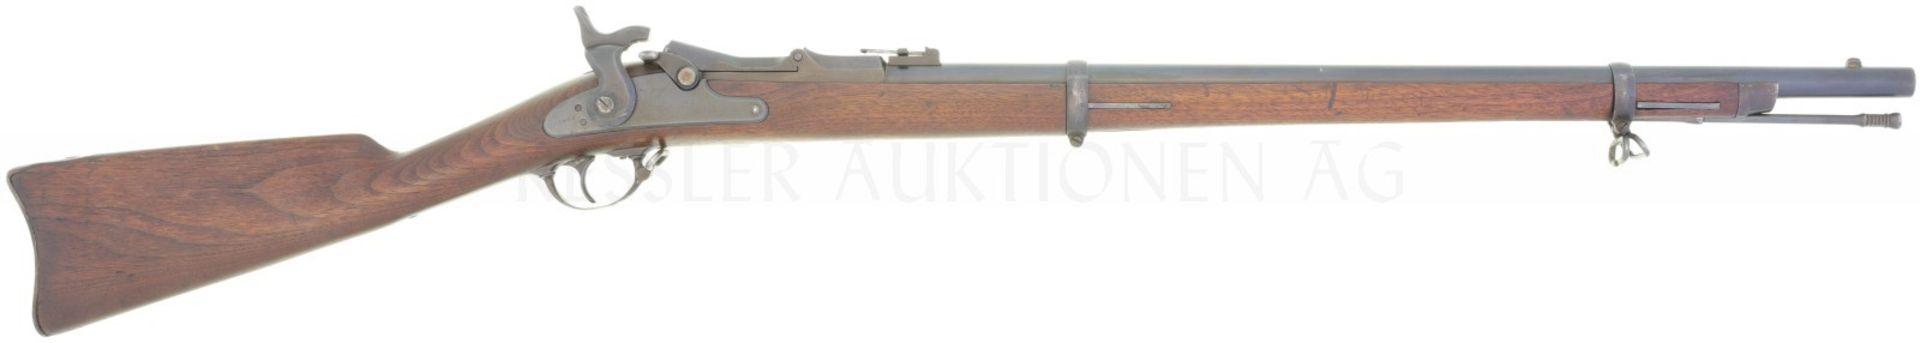 "Perkussionsgewehr, U.S. Army ""HARPERS FERRY"", Kal. .68"